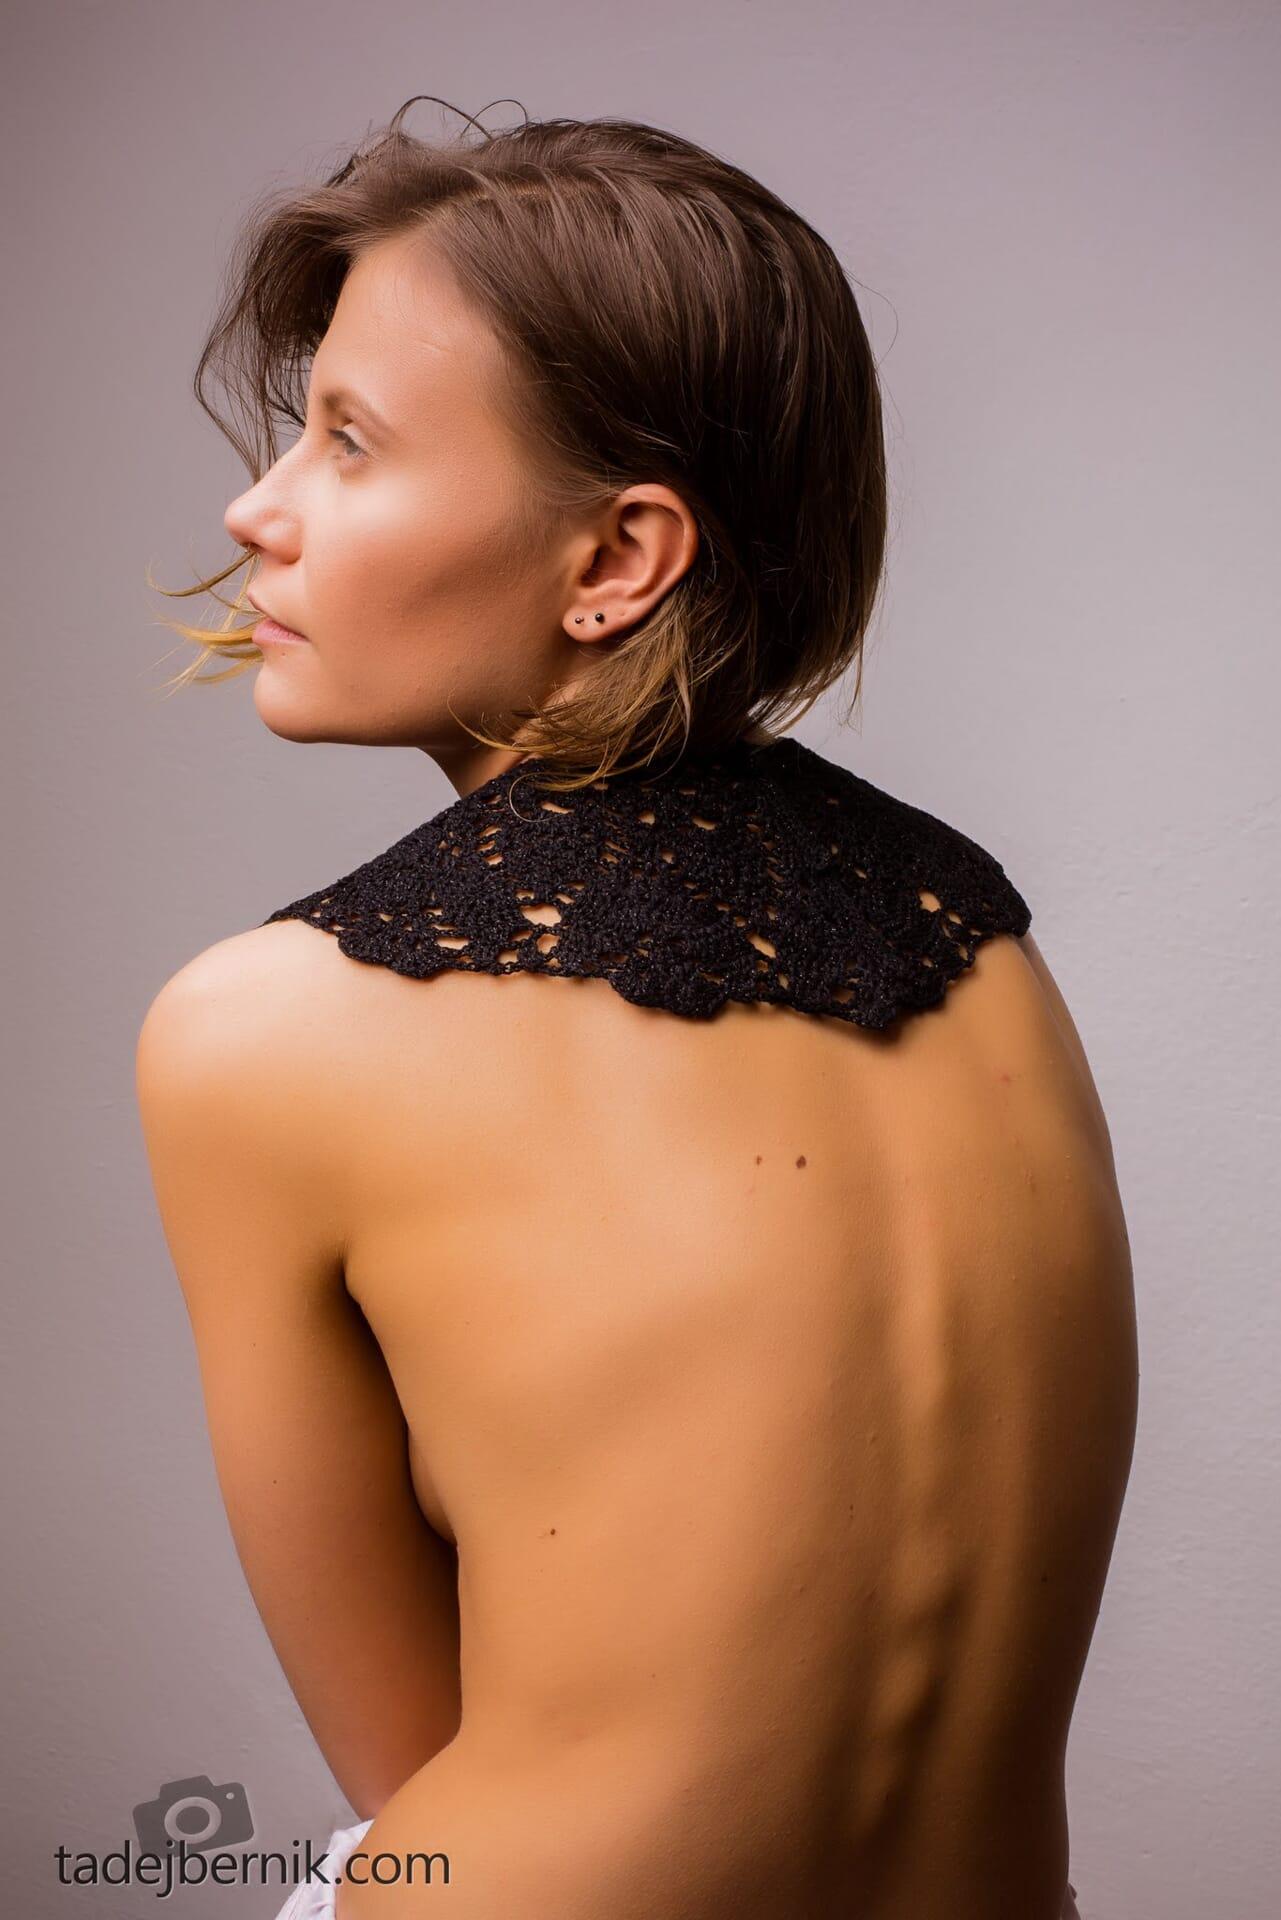 Fashion photography, modno fotografiranje